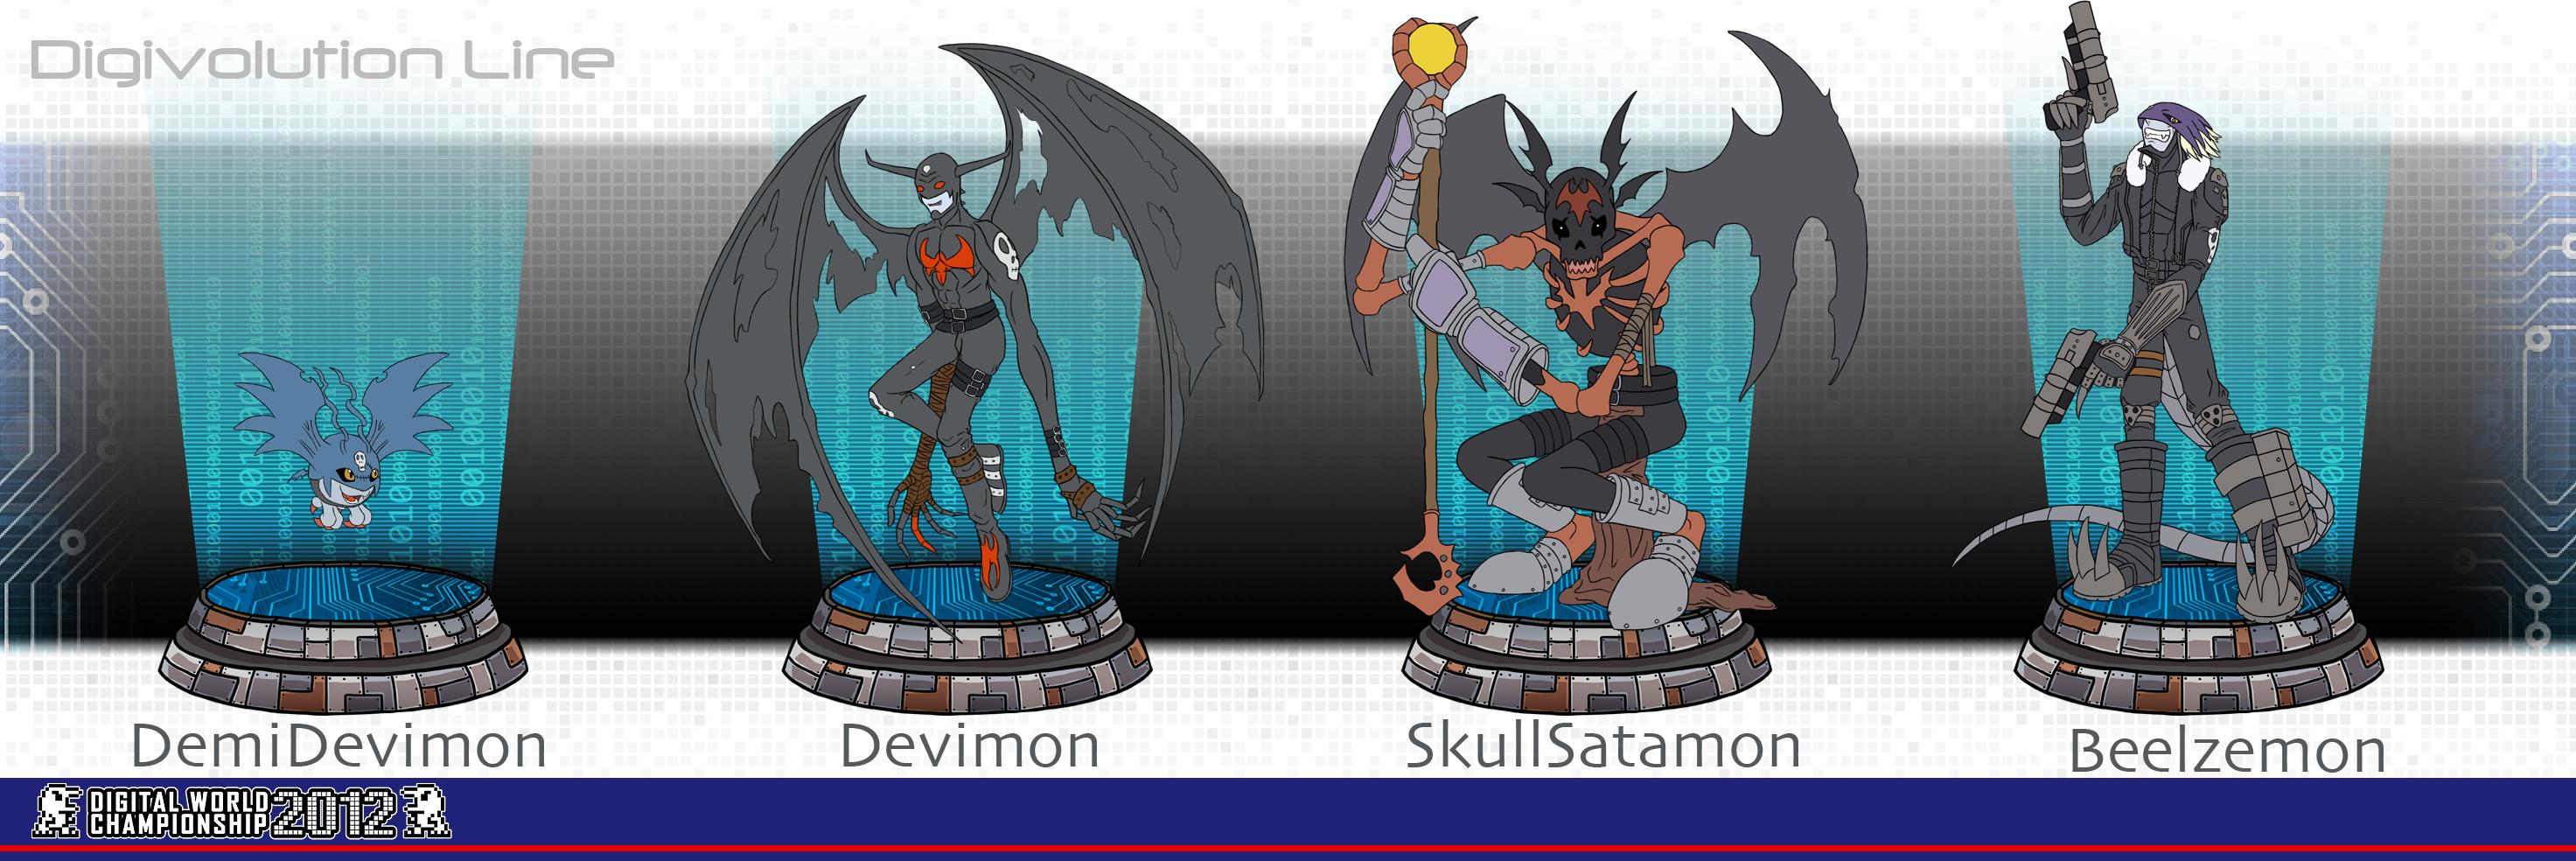 Demidevimon Evolution Line DWC 2012: Demidevimon ...